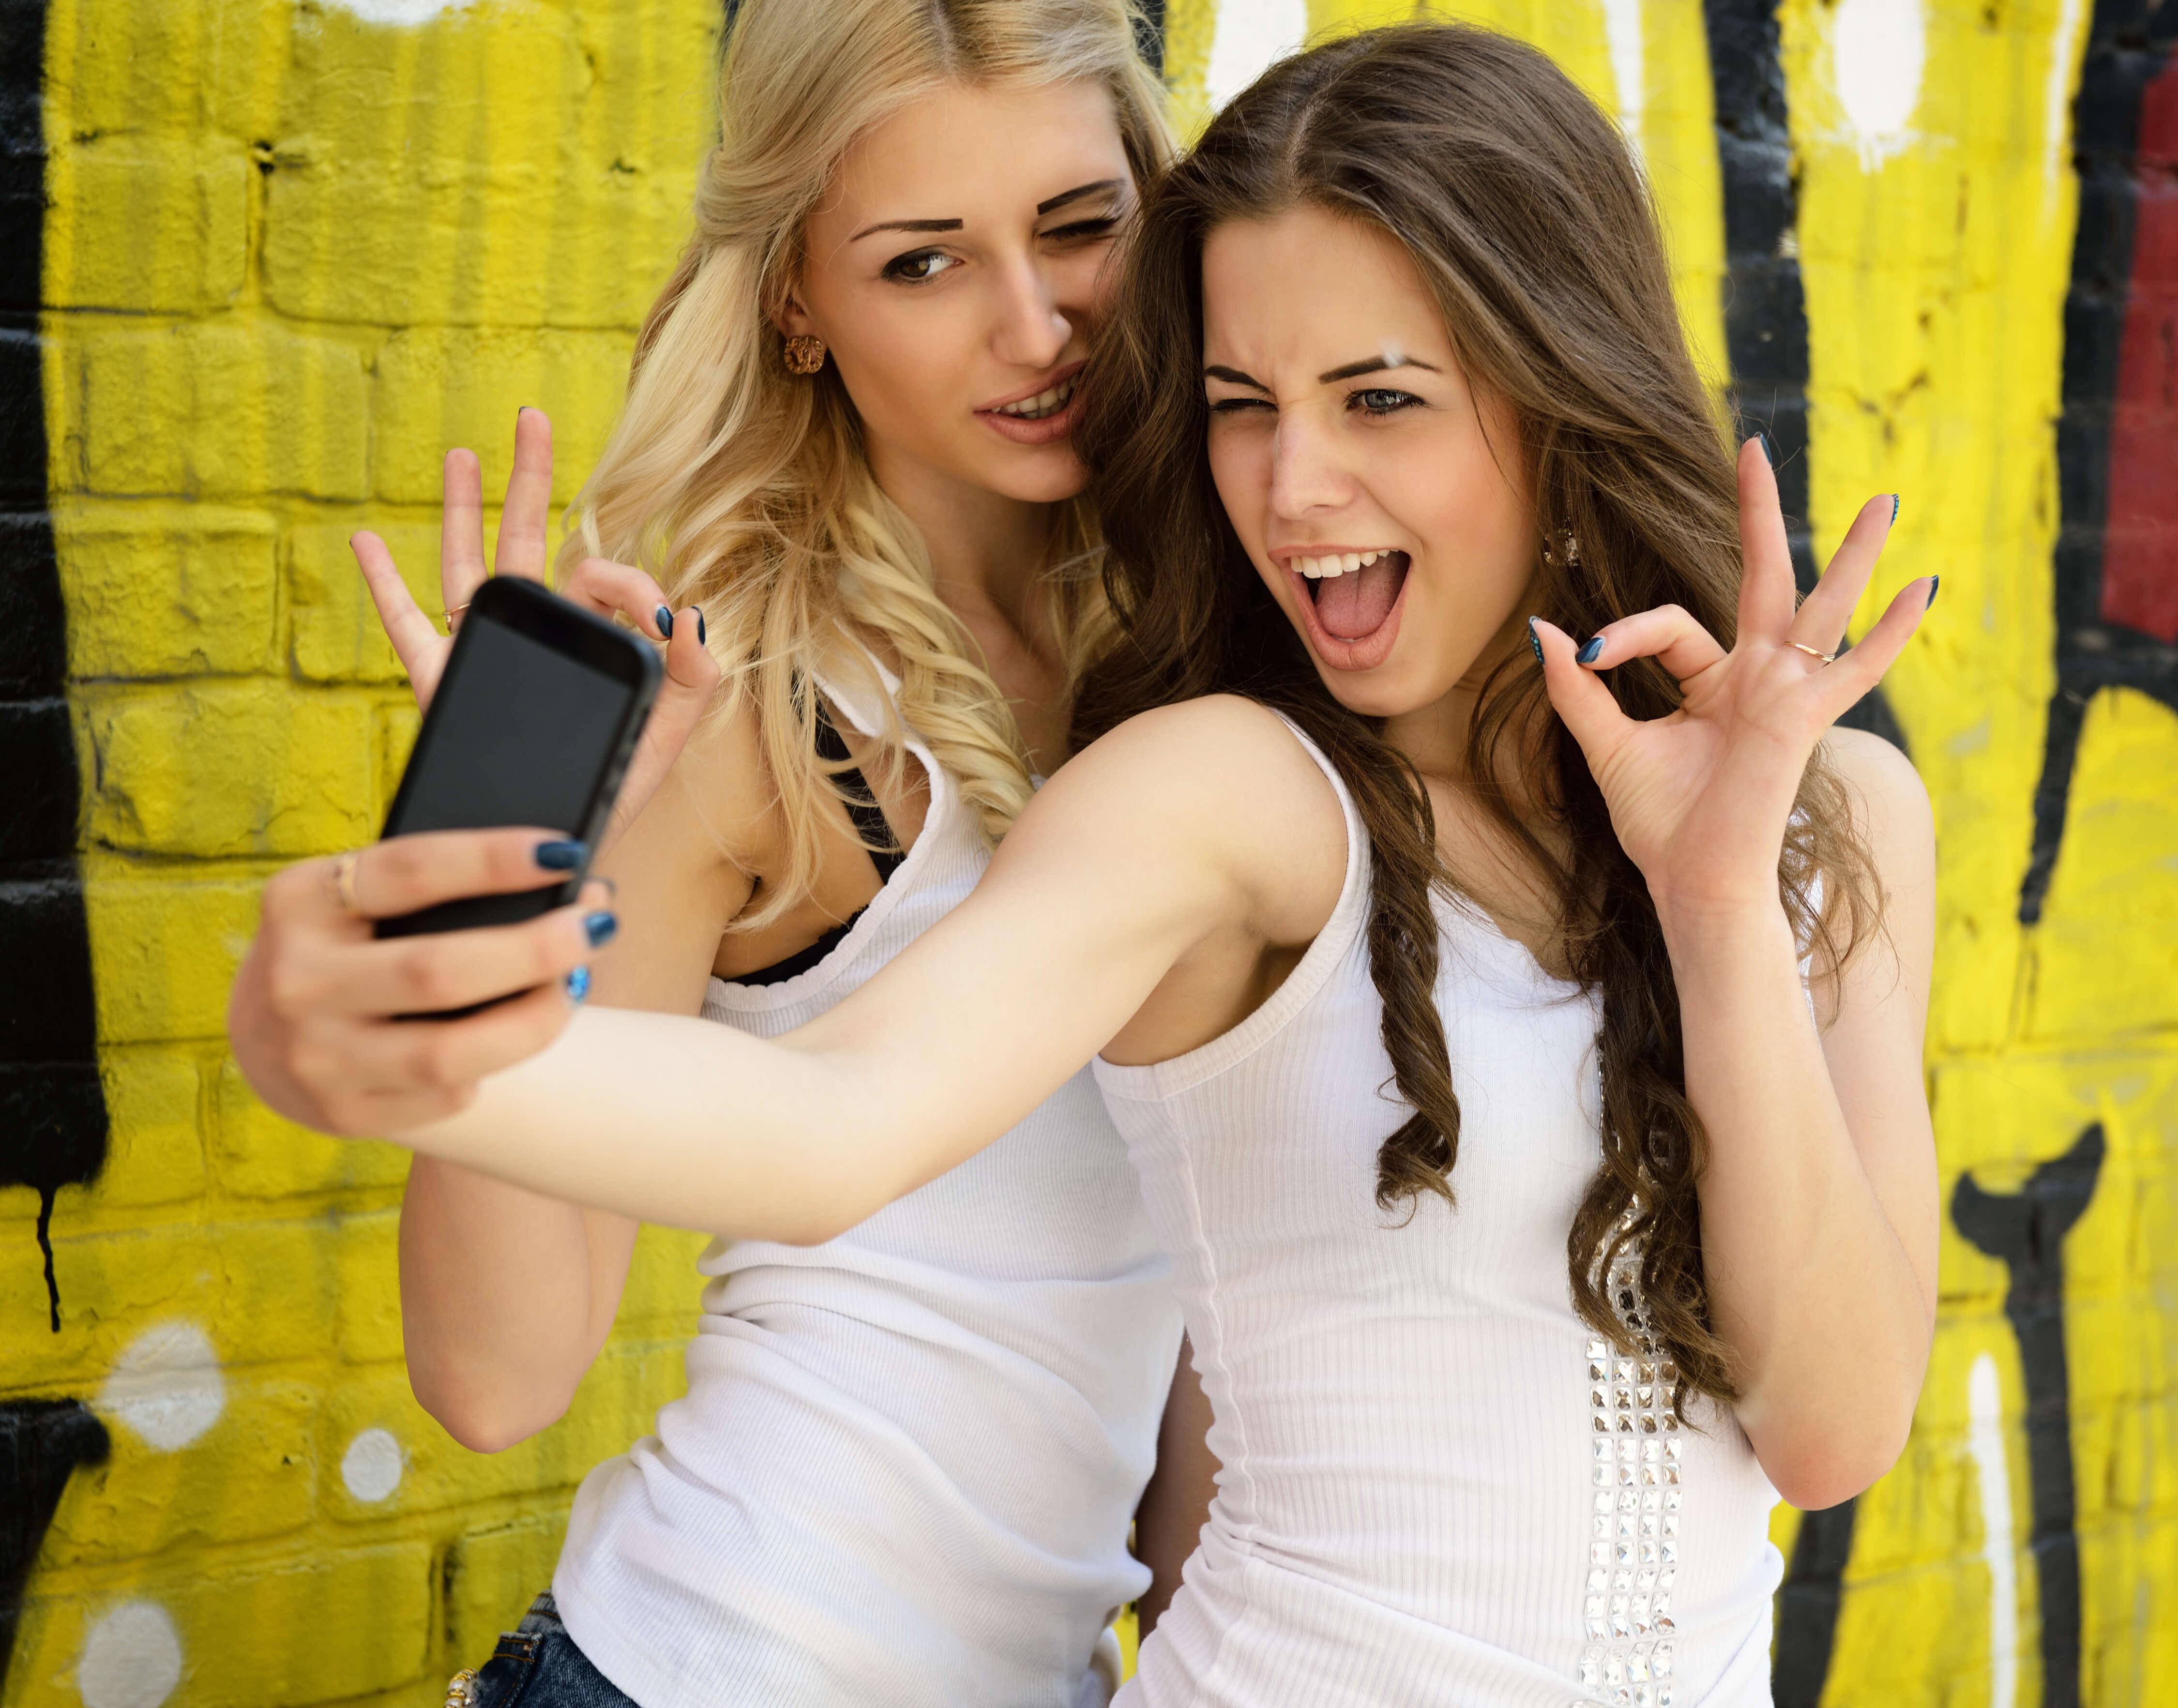 Surprise lesbian threesome in bed mobile porno